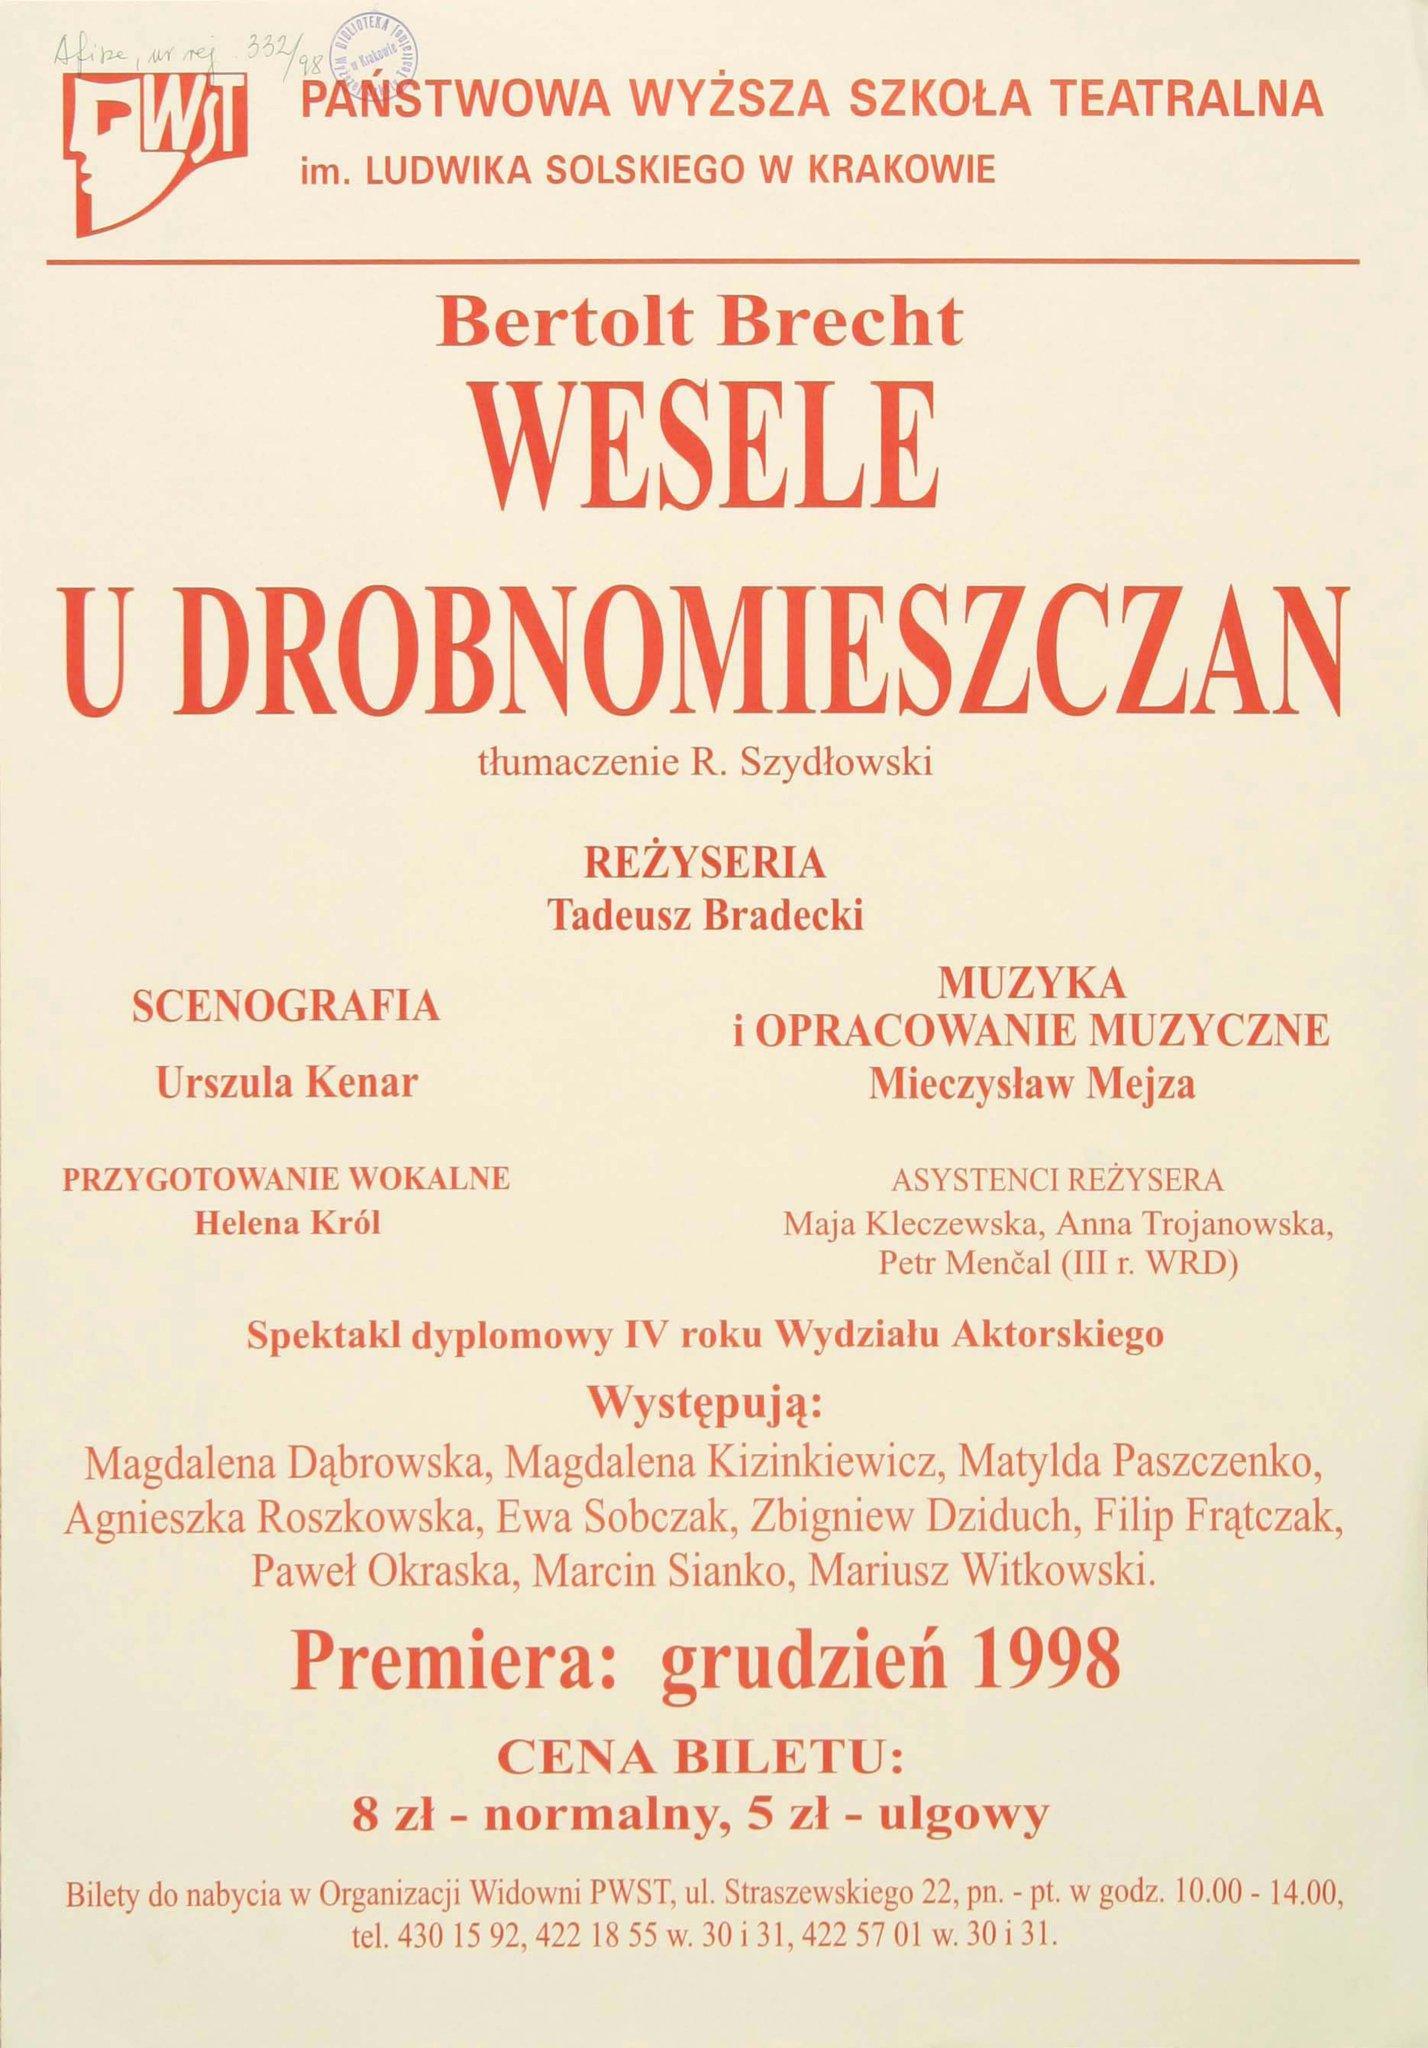 Fotokopia Programu Teatralnego